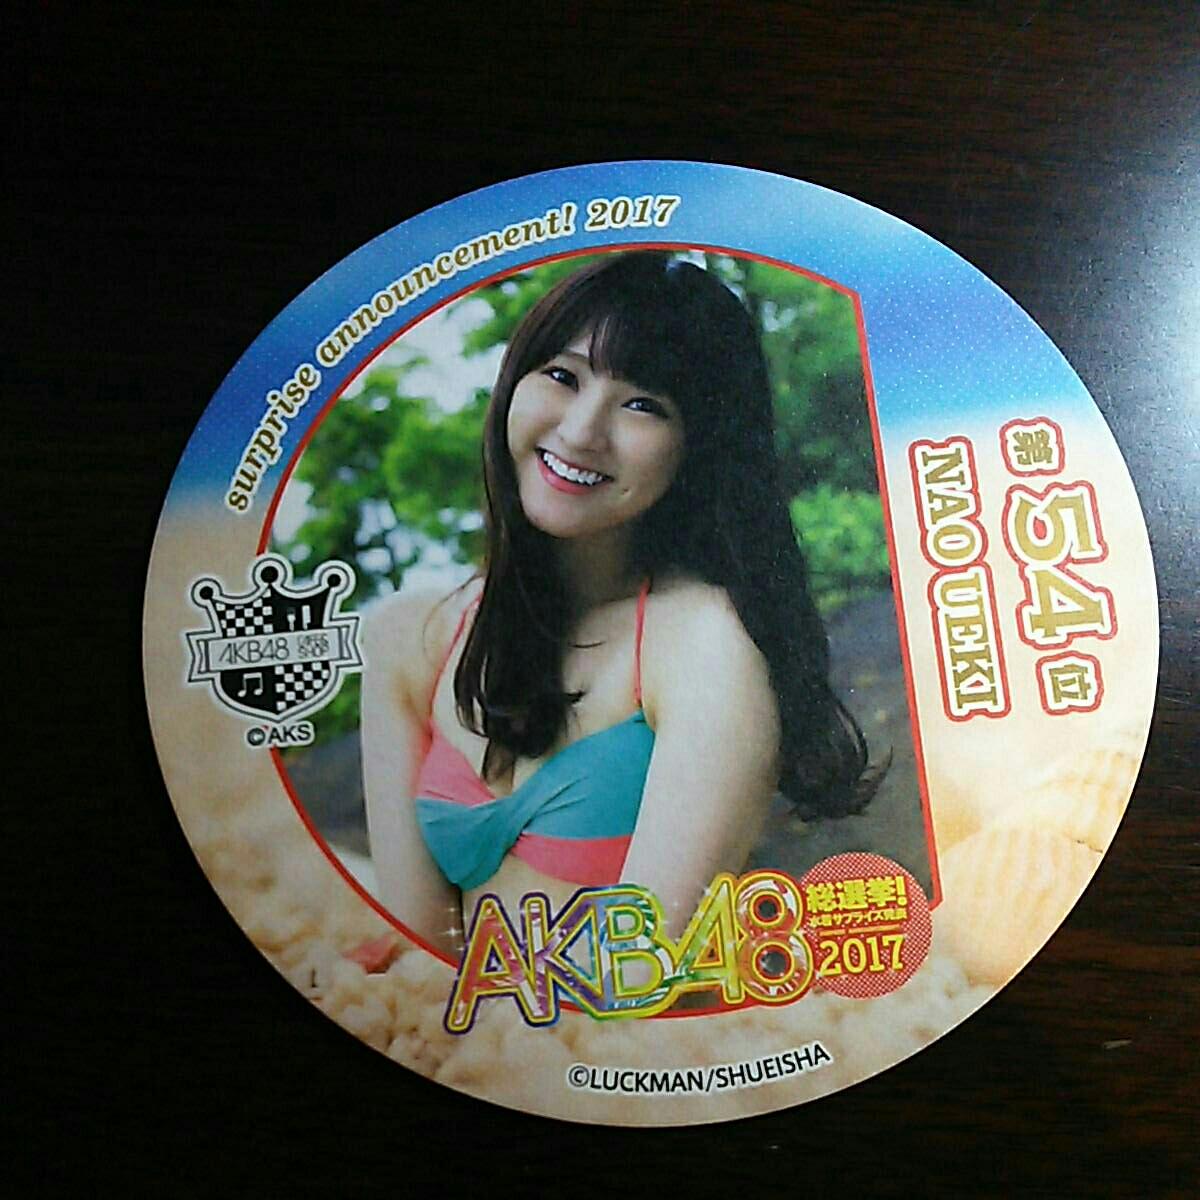 AKB48 植木南央 水着サプライズ AKBカフェコースター 総選挙2017 ランクイン HKT ライブ・総選挙グッズの画像